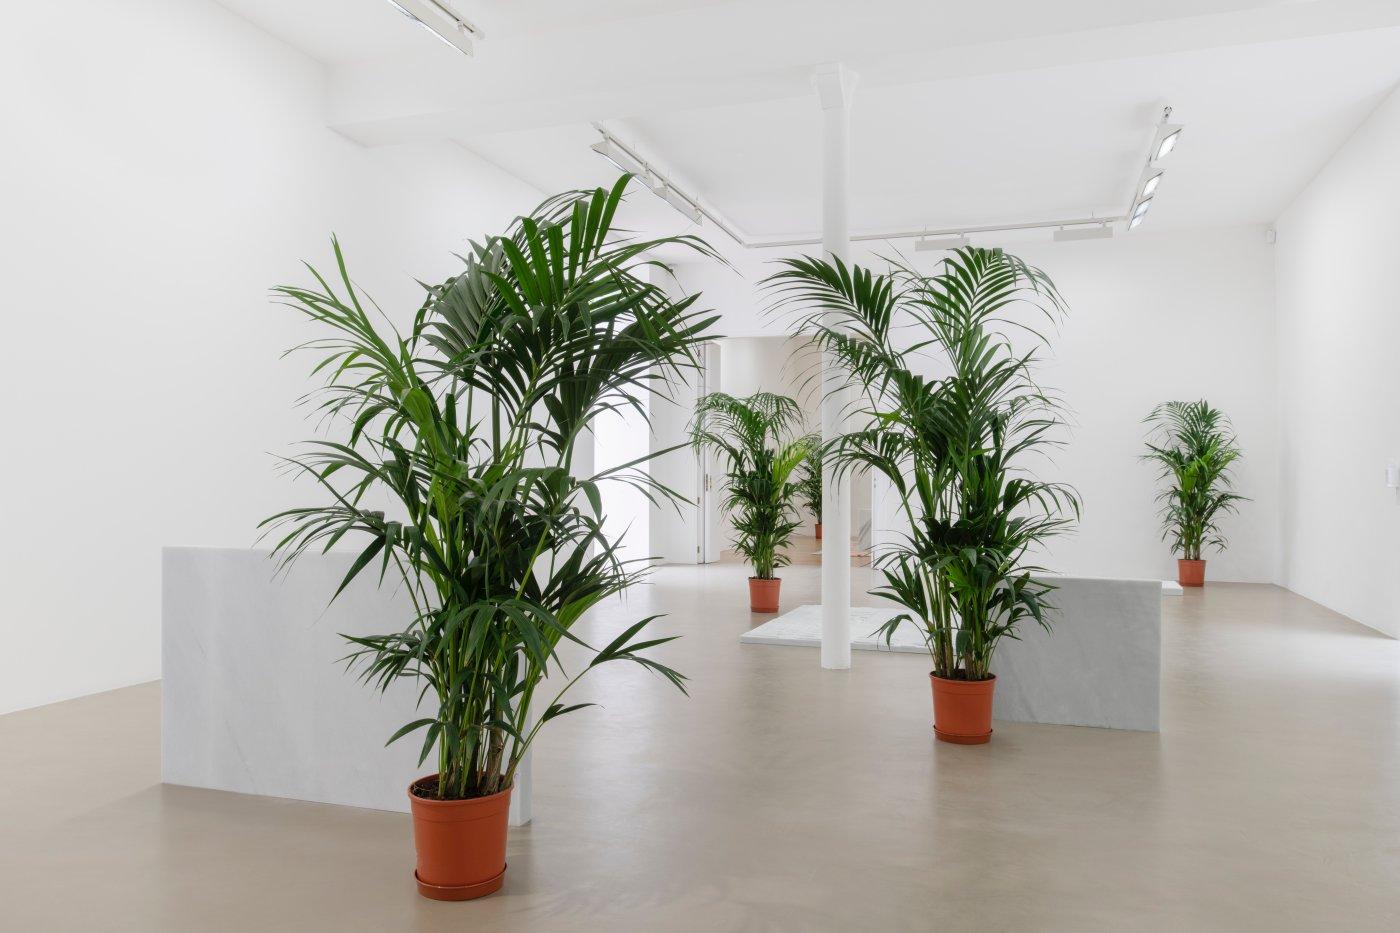 Galerie Chantal Crousel Rirkrit Tiravanija 3